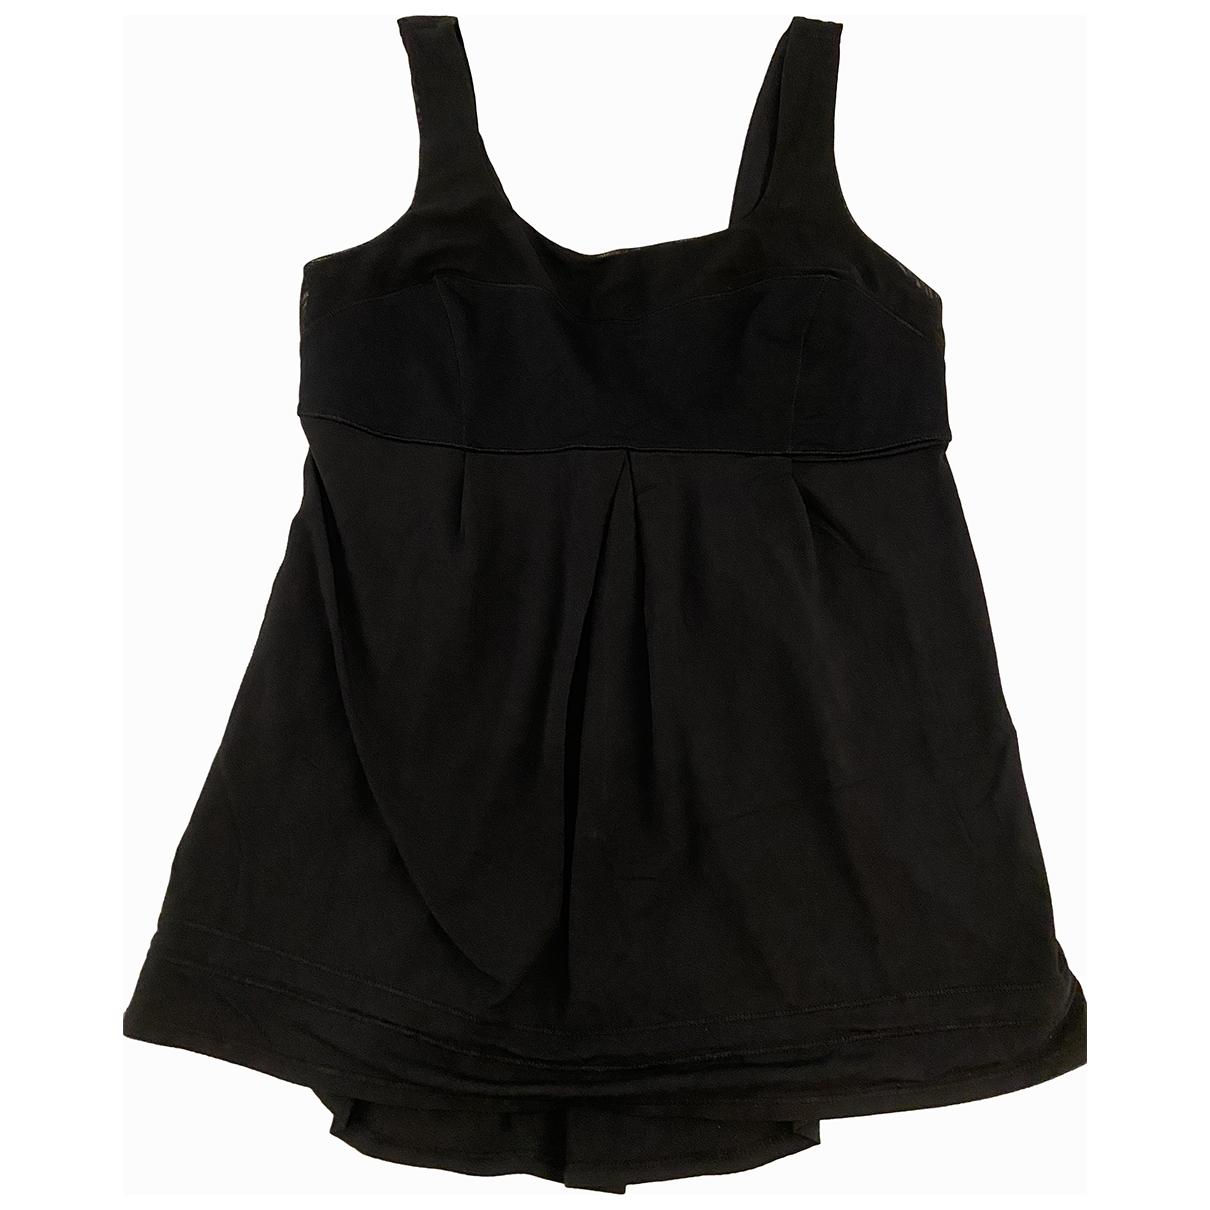 Lululemon \N Black  top for Women 8 US